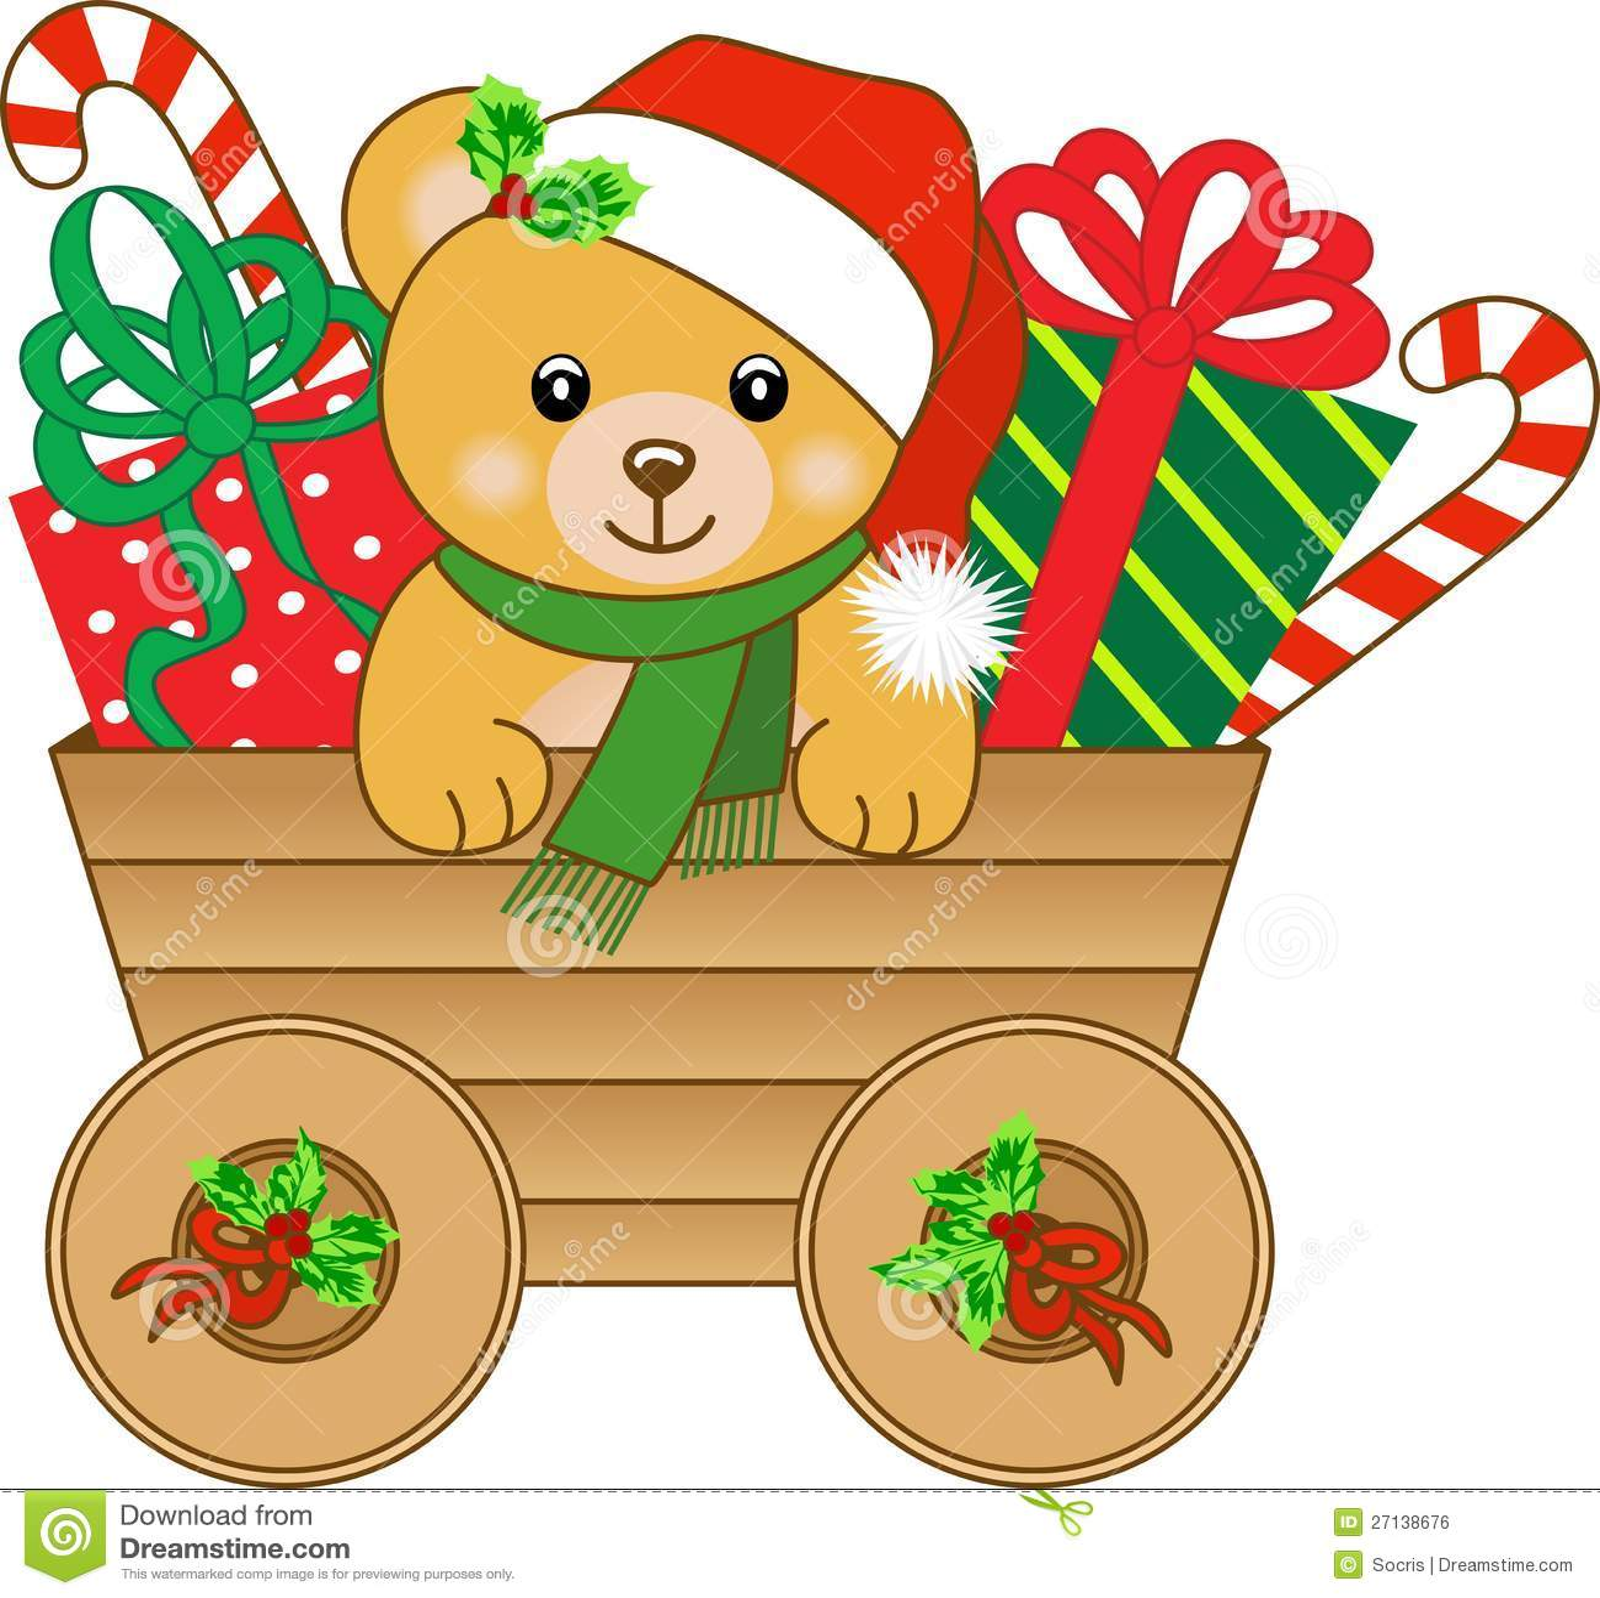 cb1bfaa502 Christmas Cart With Teddy Bear Stock Vector - Illustration of sweet ...